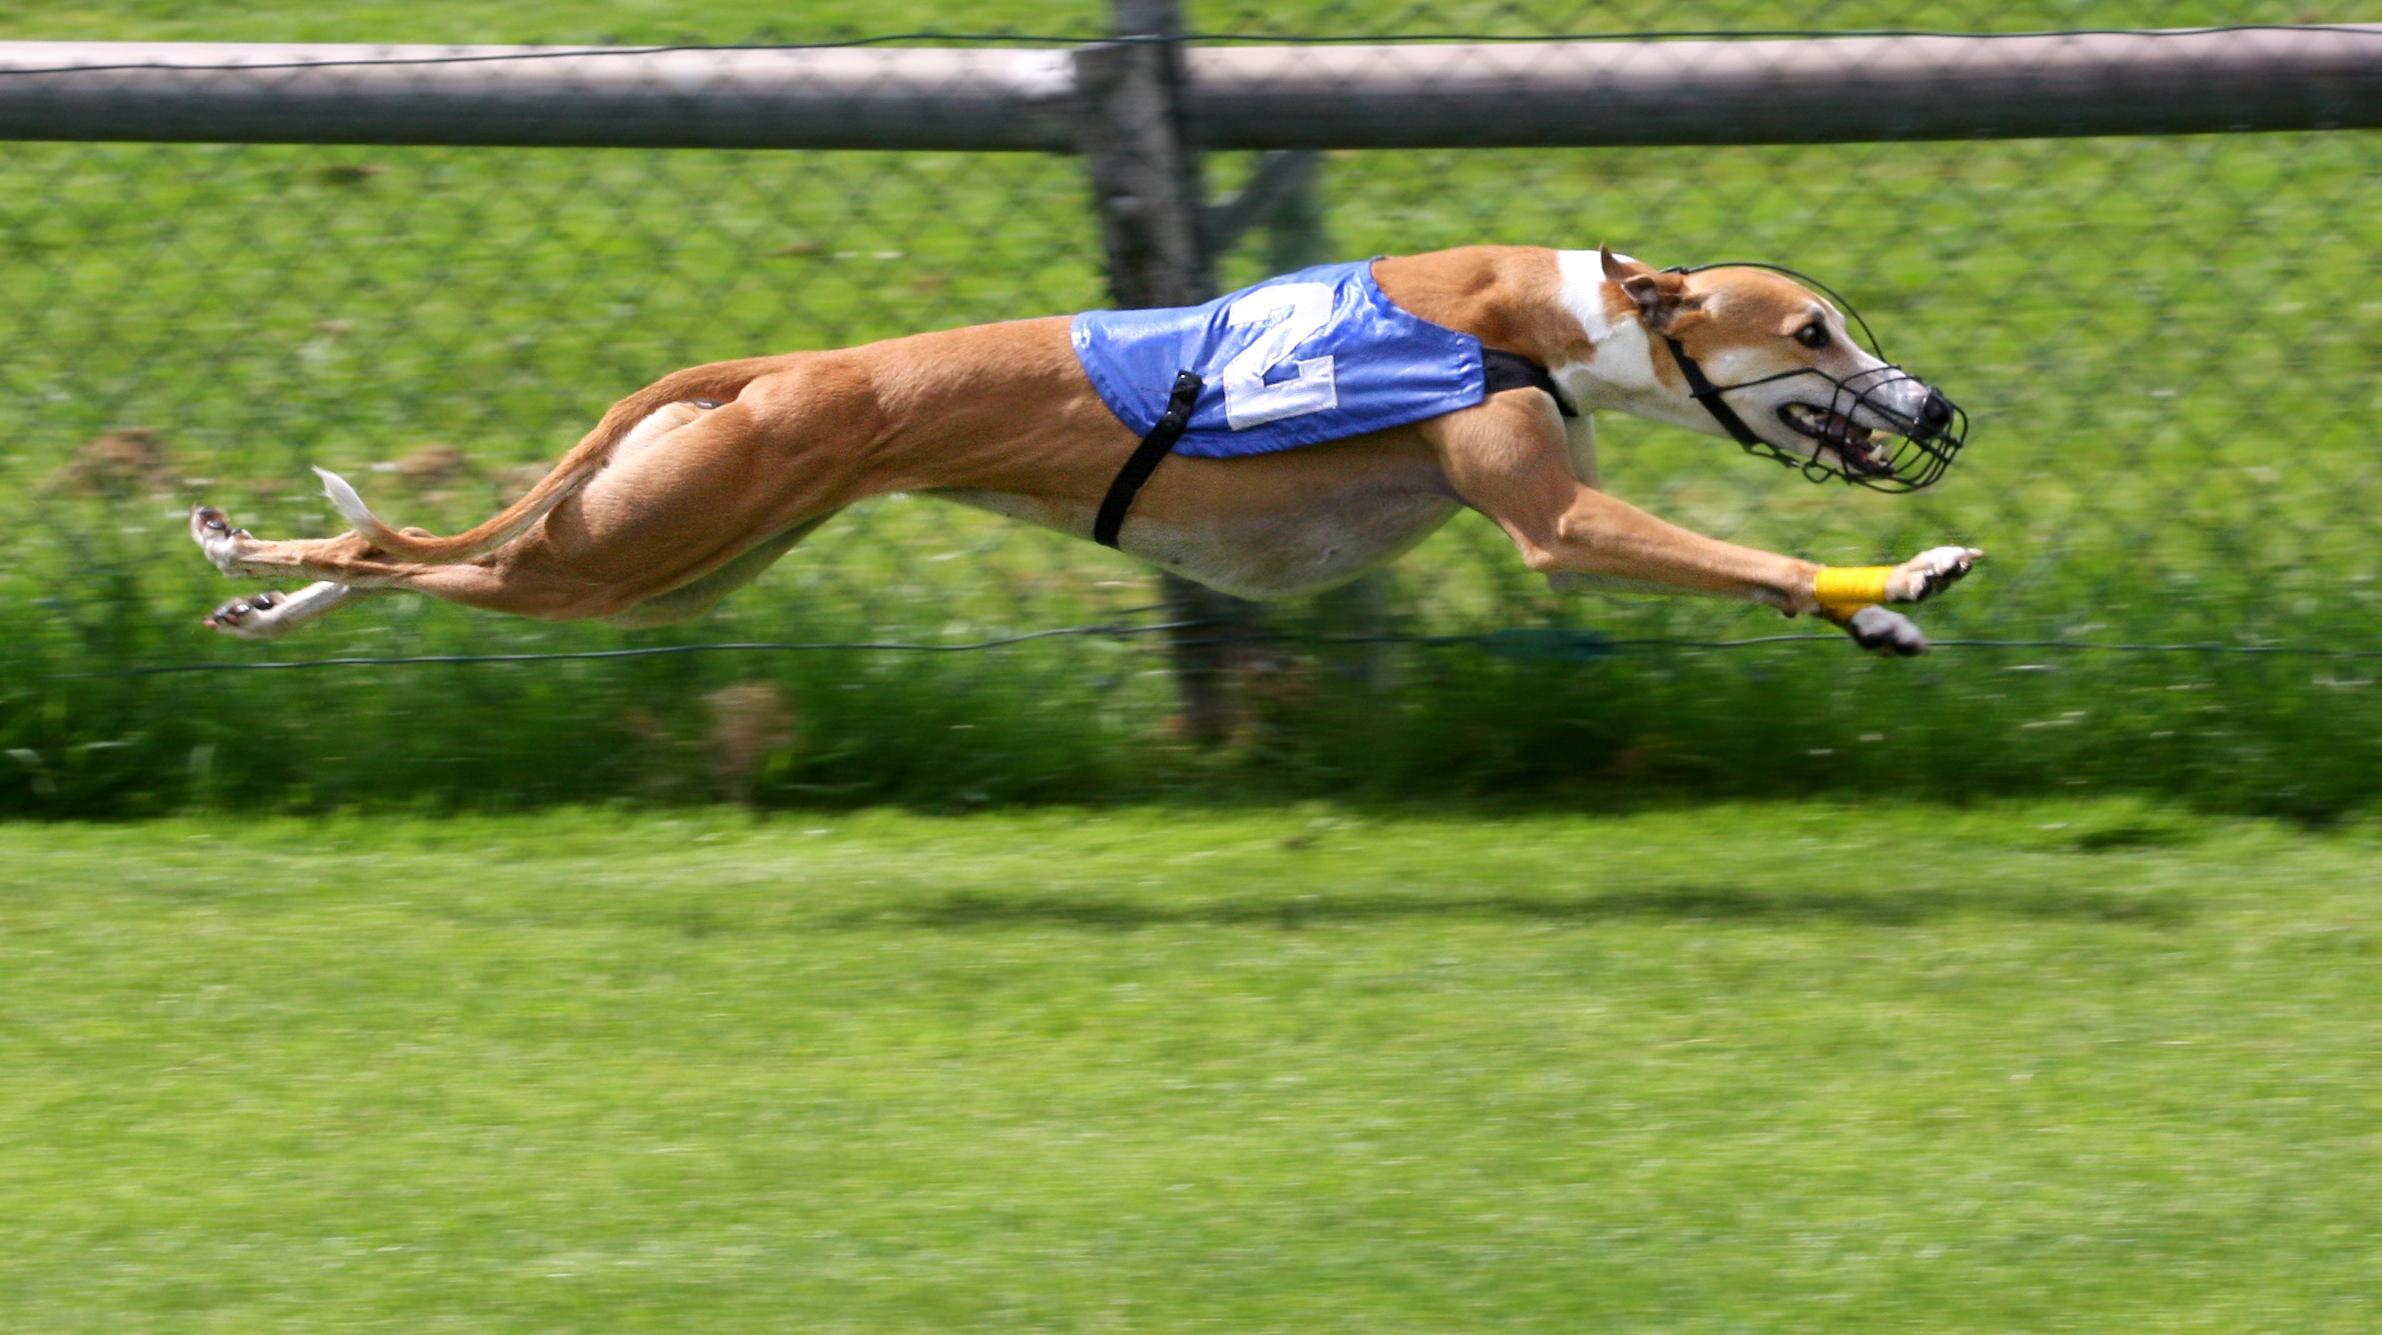 Greyhound_Racing_2_amk.jpg